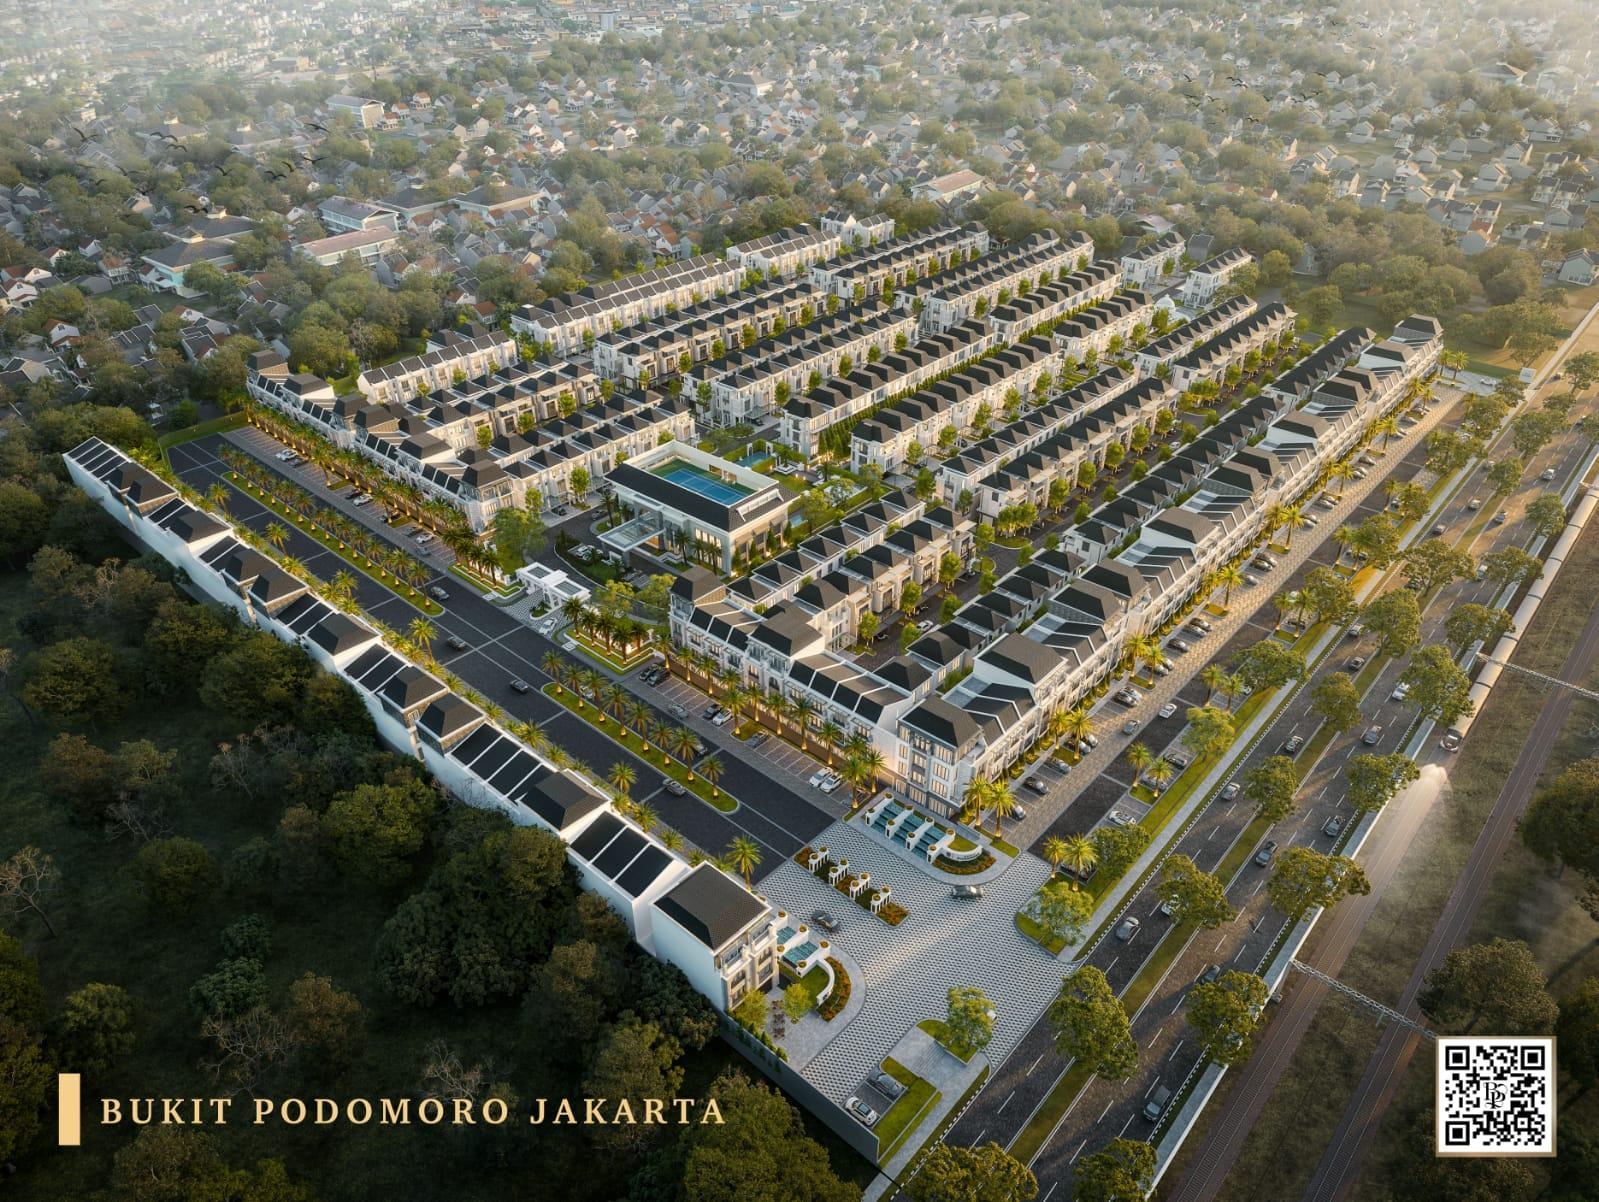 Jakarta Punya Magnet Baru, Hunian Mewah Impian di Ibu Kota